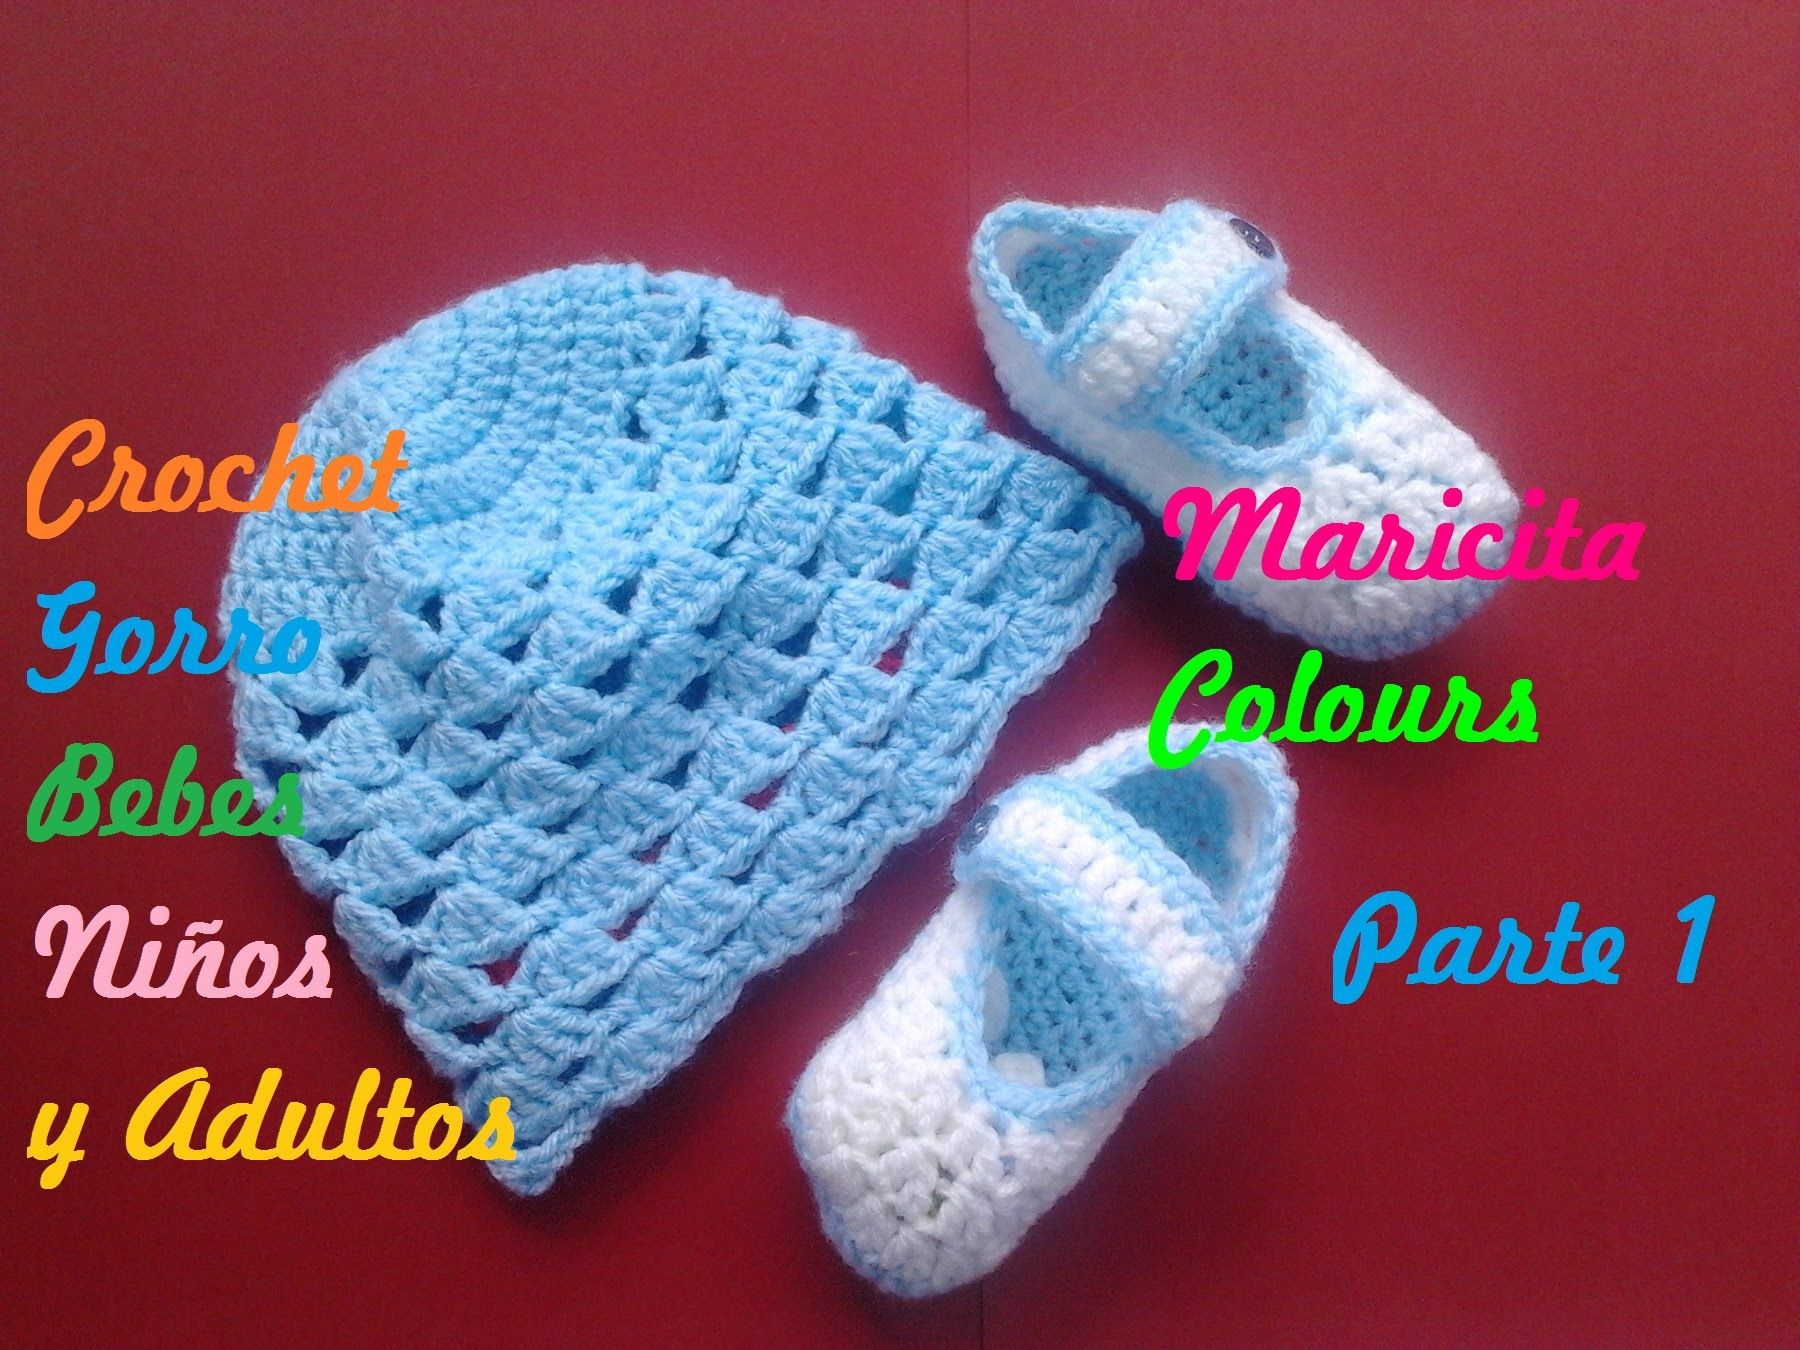 Crochet Tutorial Gorro Bebe Celeste (Parte 1) Subtitles English ...